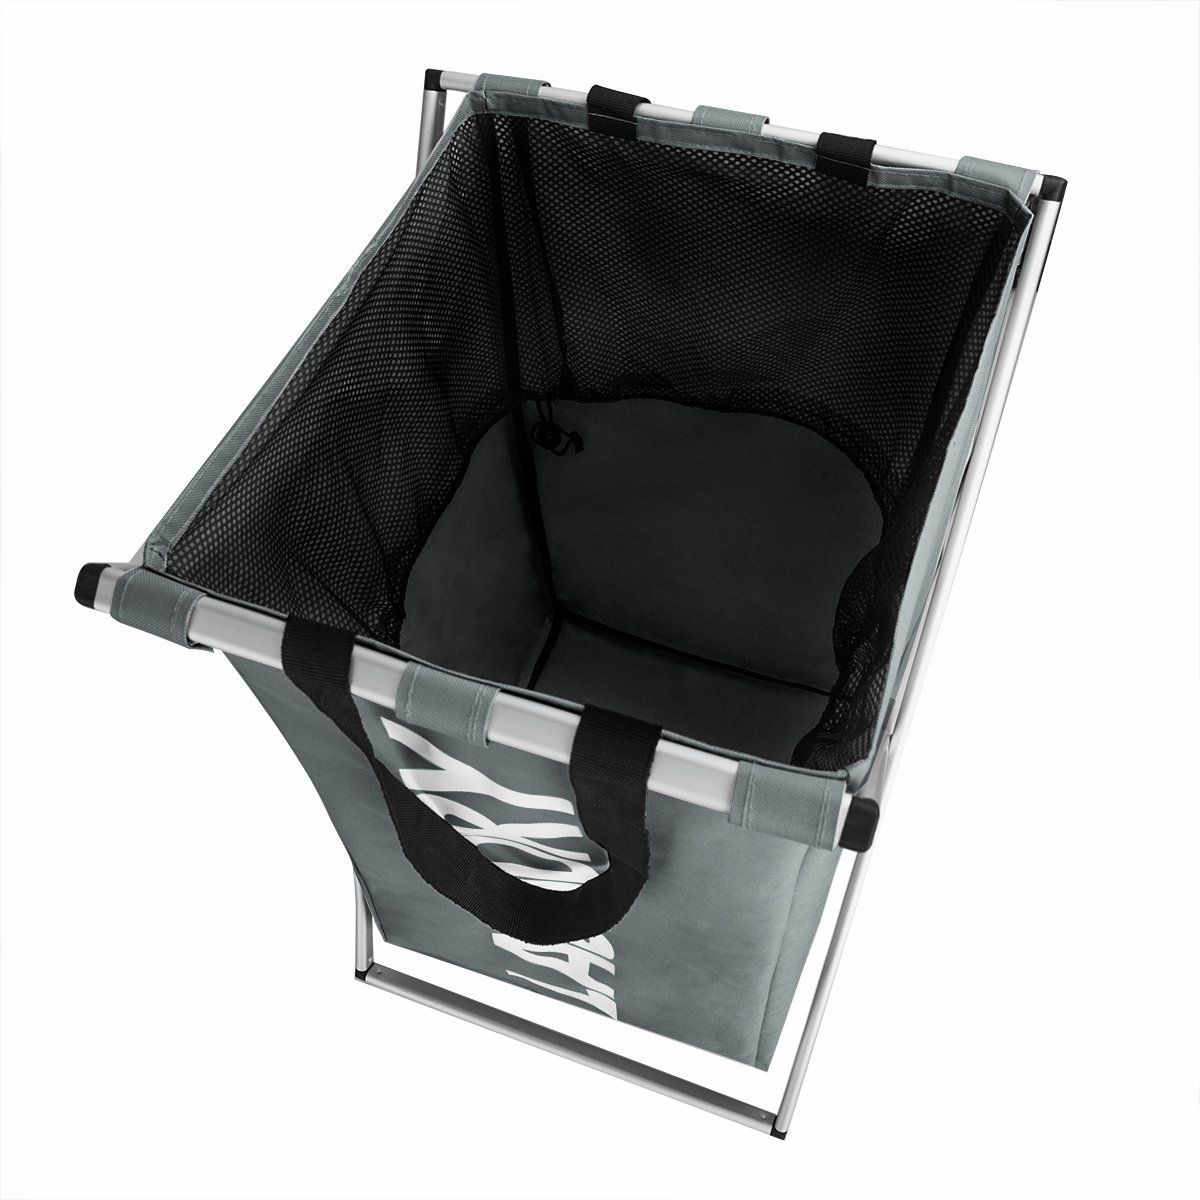 Laundry Hamper Oxford Metal Xframe Laundry Basket Clothes Storage